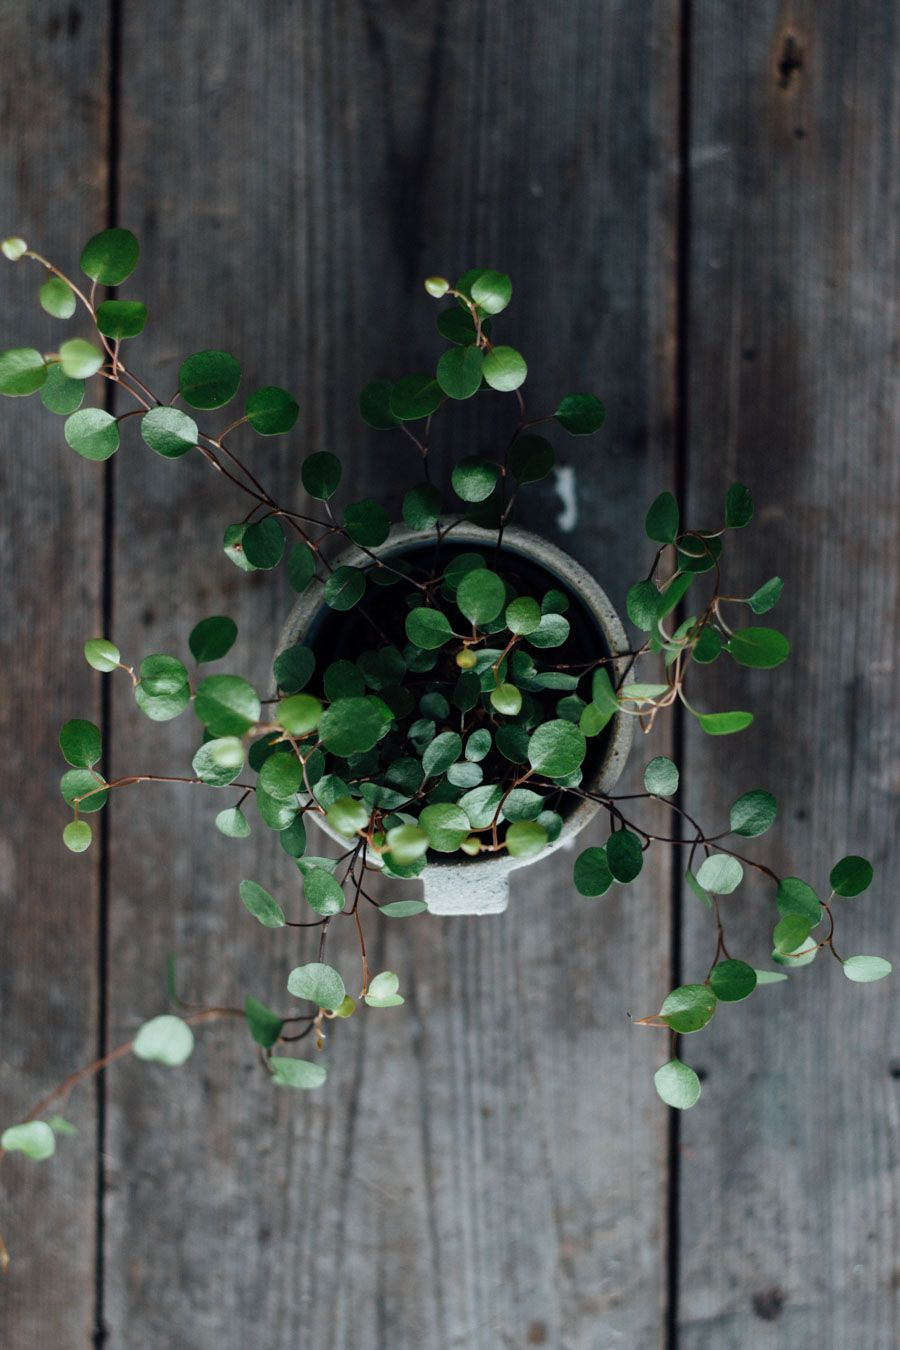 Edera Pianta Da Interno australian ivy plant | piante da interno, piante e piantare